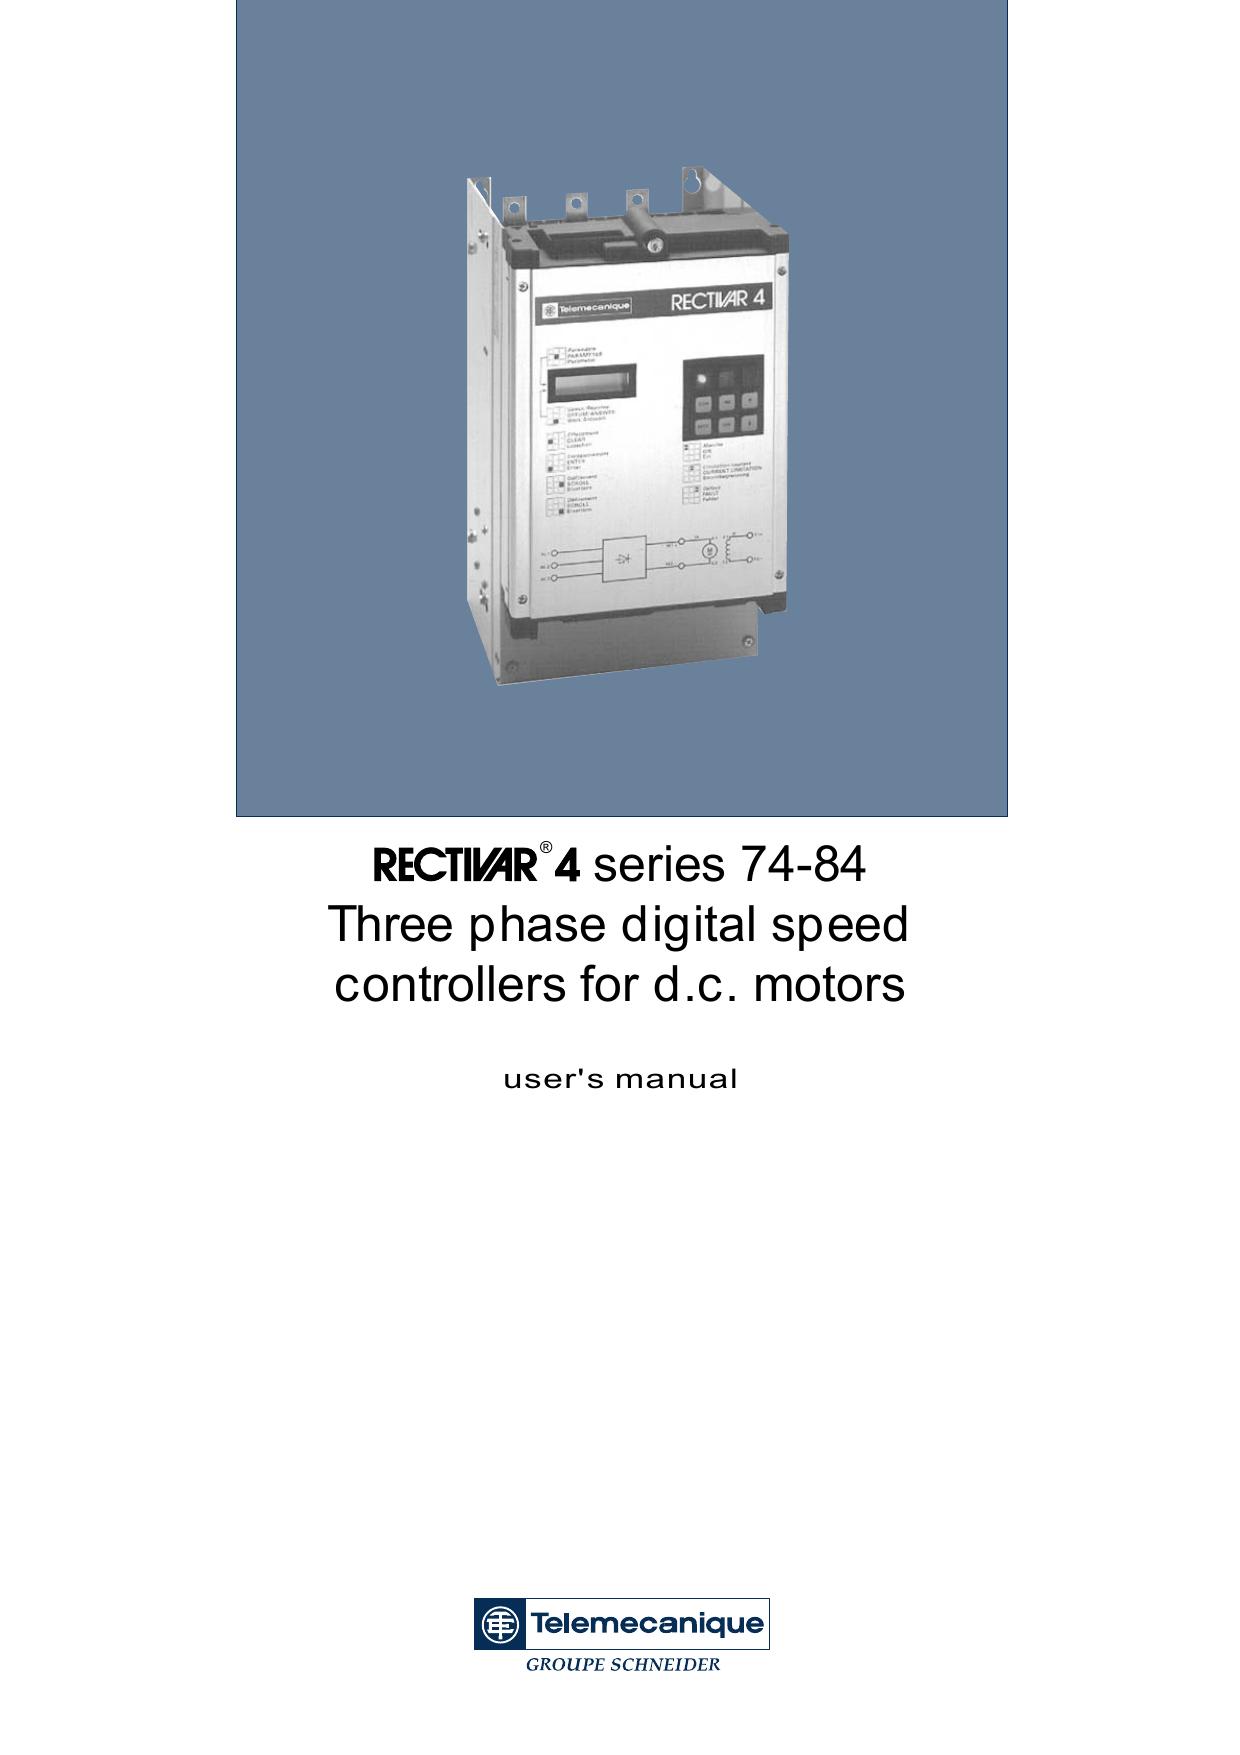 R 4series 74-84 Three phase digital speed